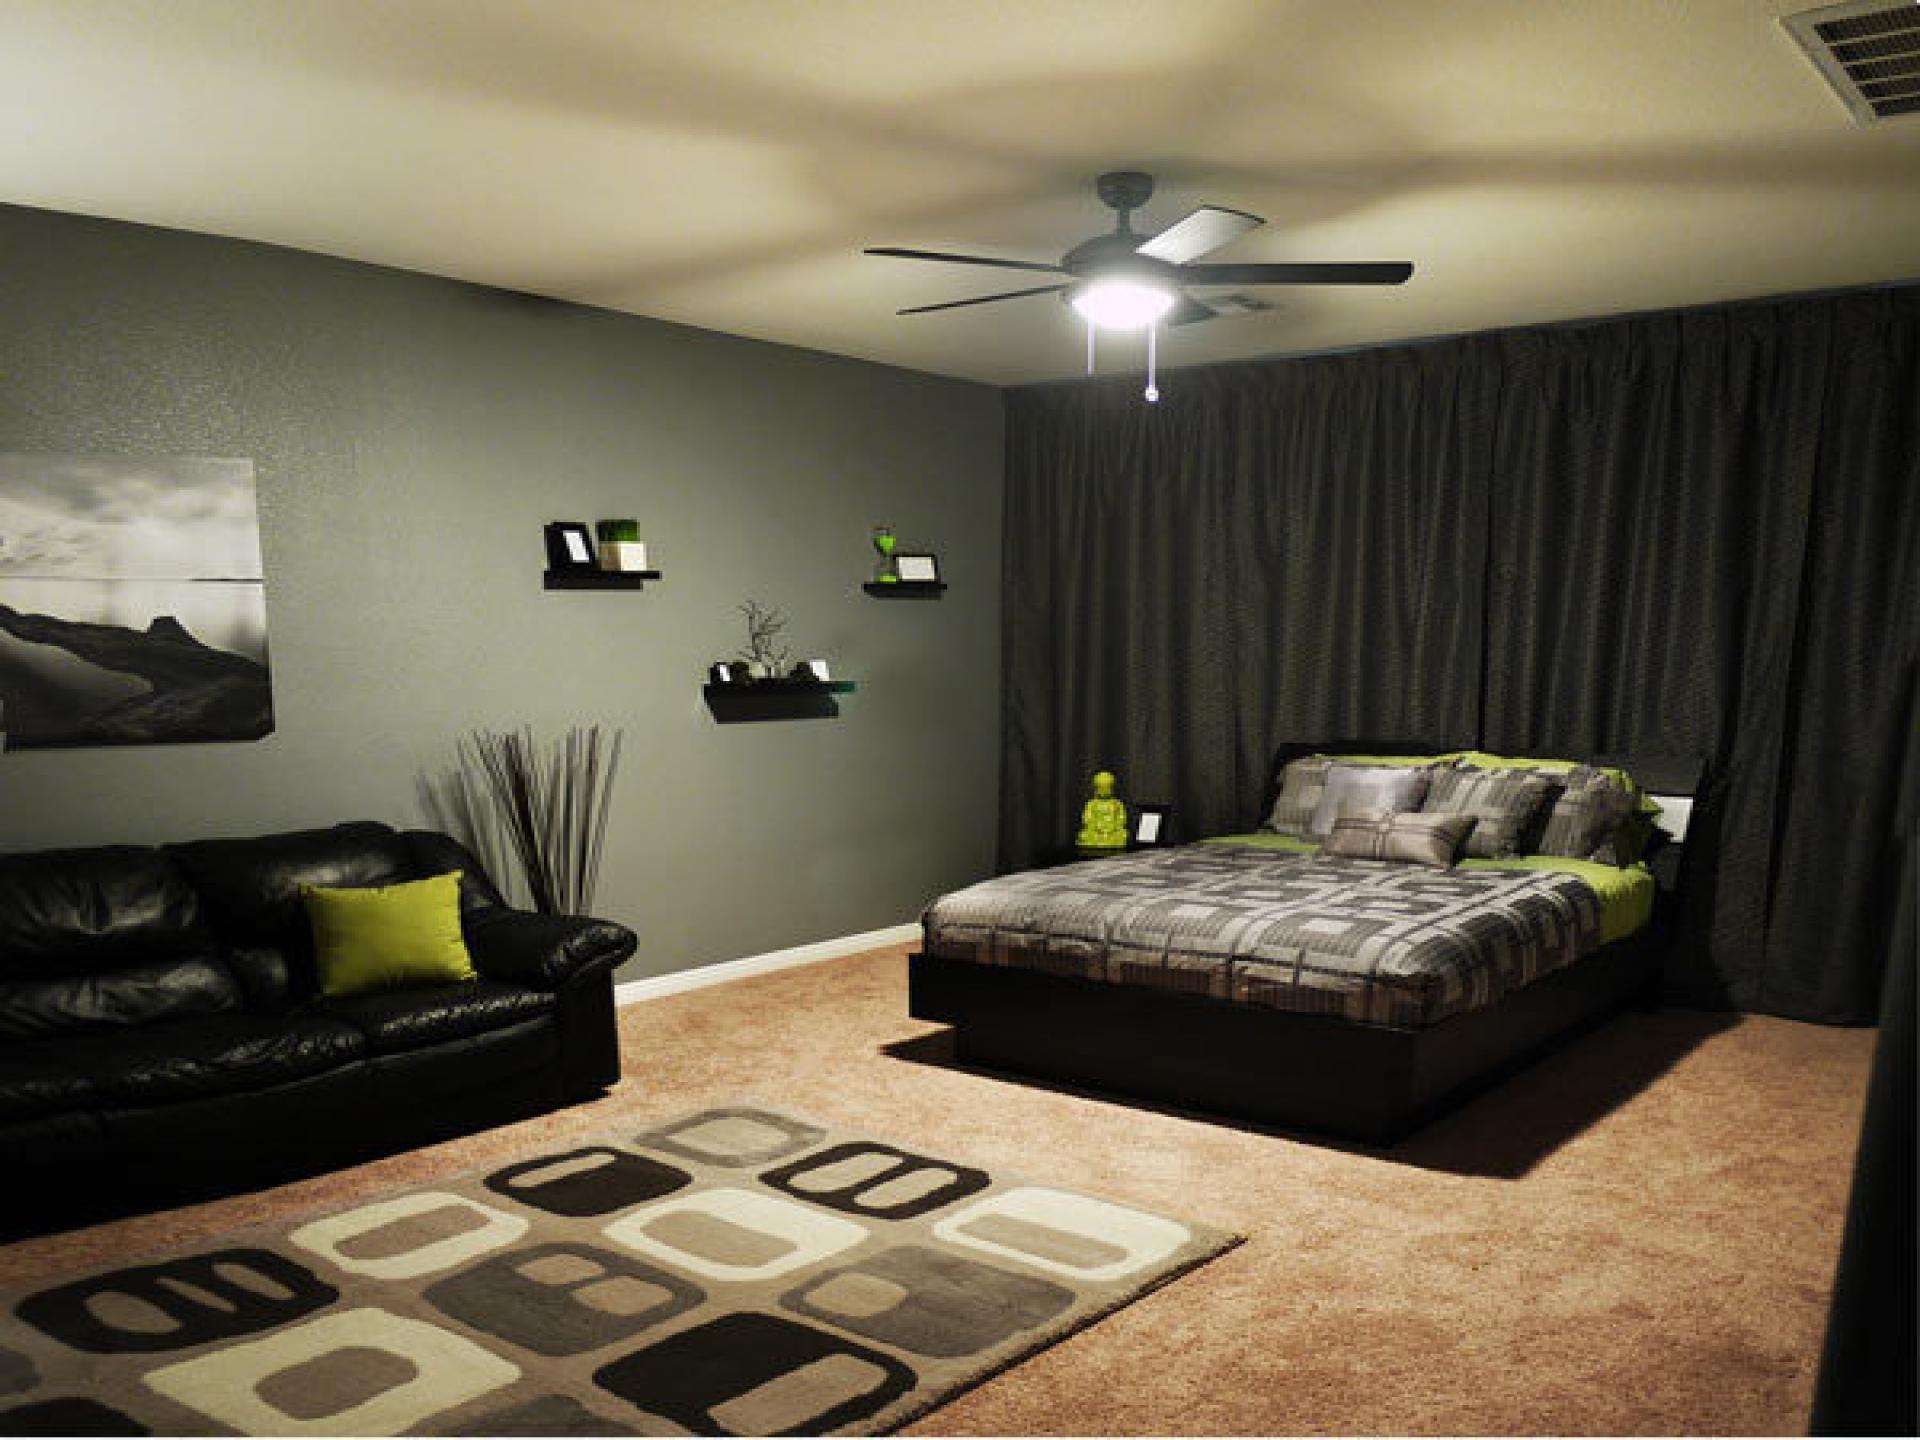 The Happy Housie Home Decor DIY Lifestyle Blog